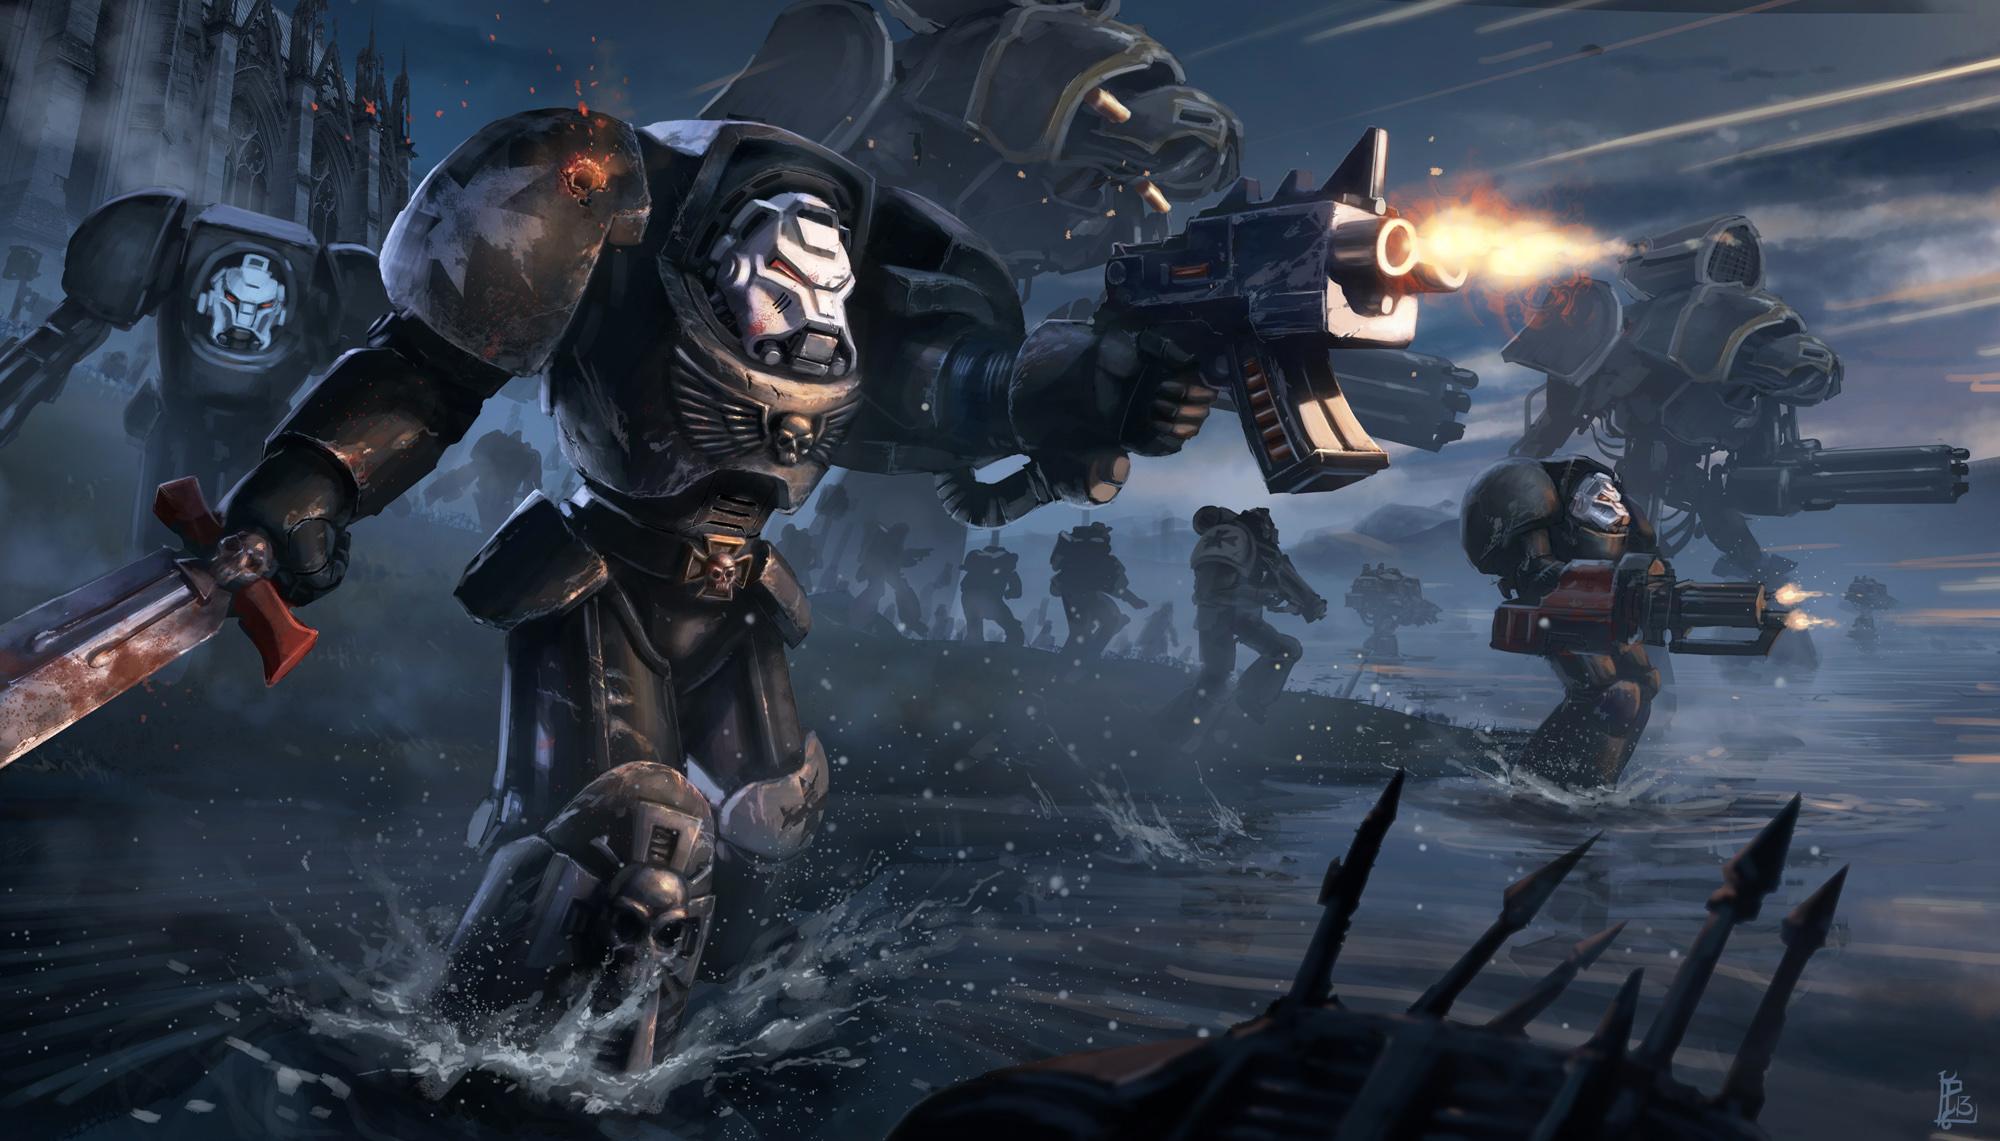 Warhammer 40k Space Marines sci fi warrior mech mecha weapon gun 2000x1141